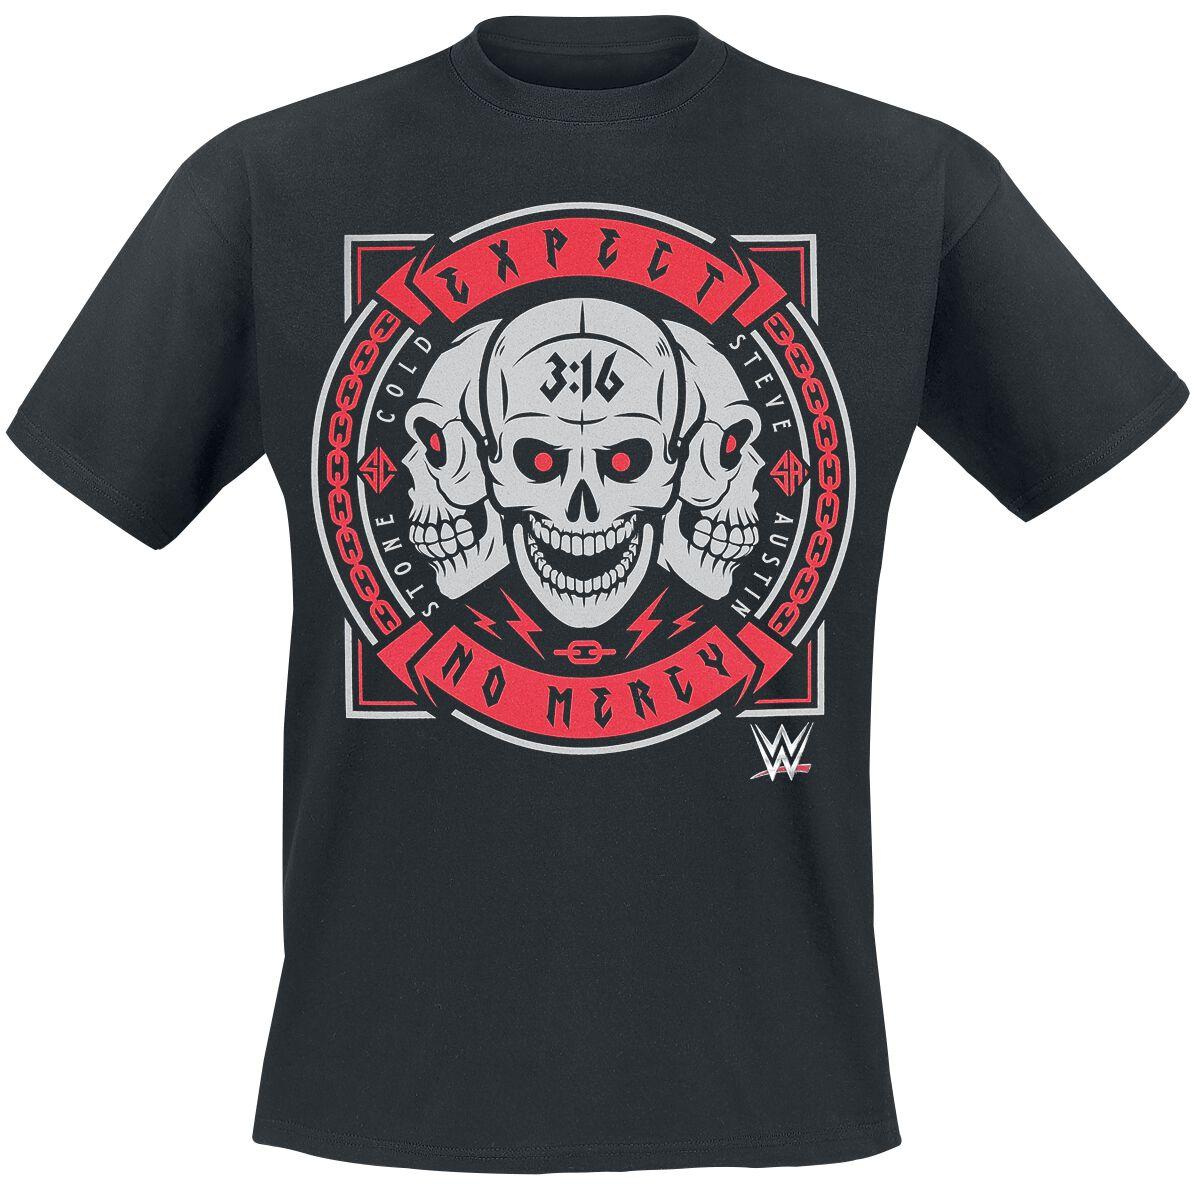 Merch dla Fanów - Koszulki - T-Shirt WWE Steve Austin - Expect No Mercy T-Shirt czarny - 377796